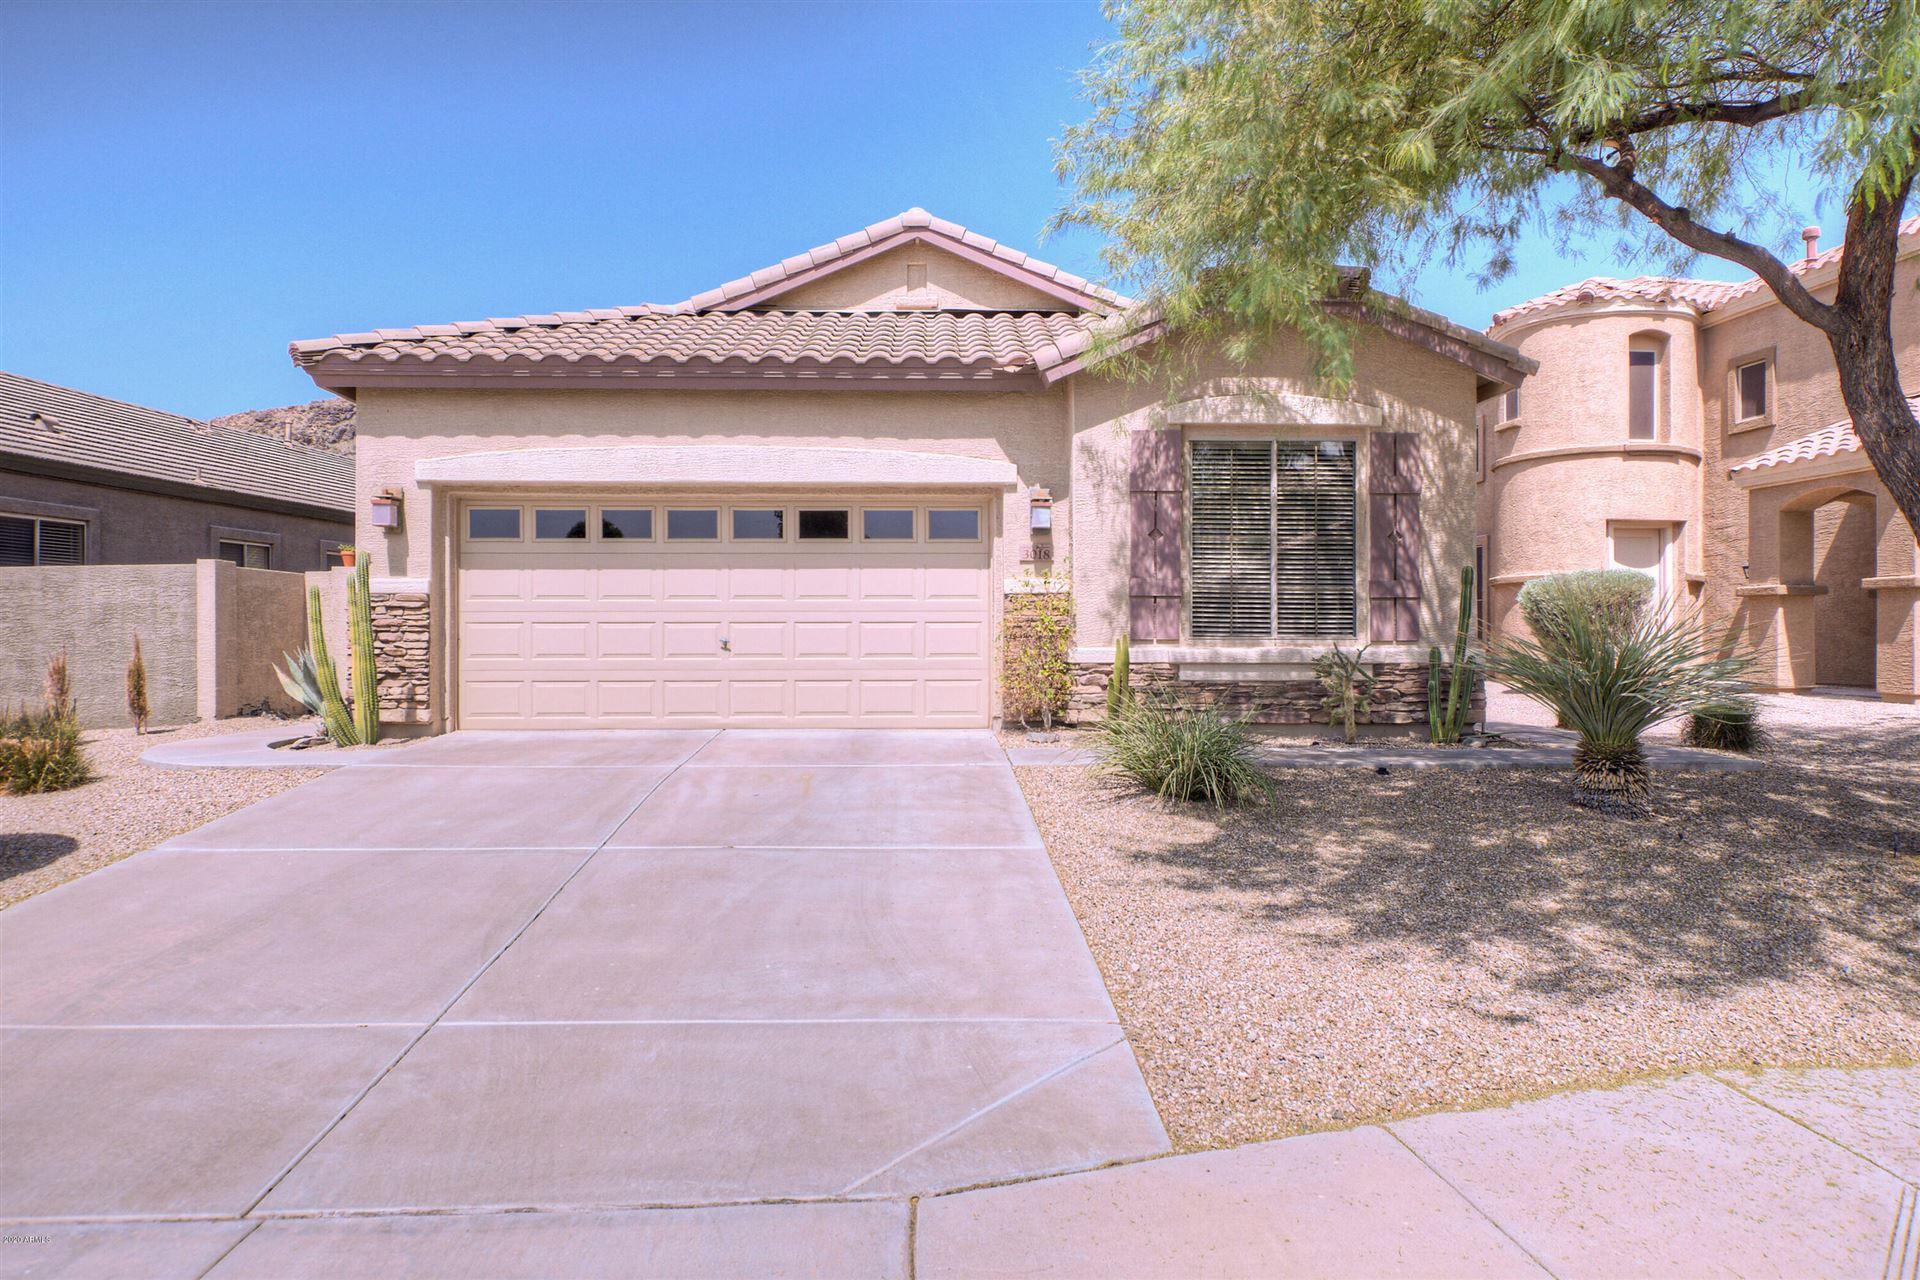 3018 W WINDSONG Drive, Phoenix, AZ 85045 - MLS#: 6133599